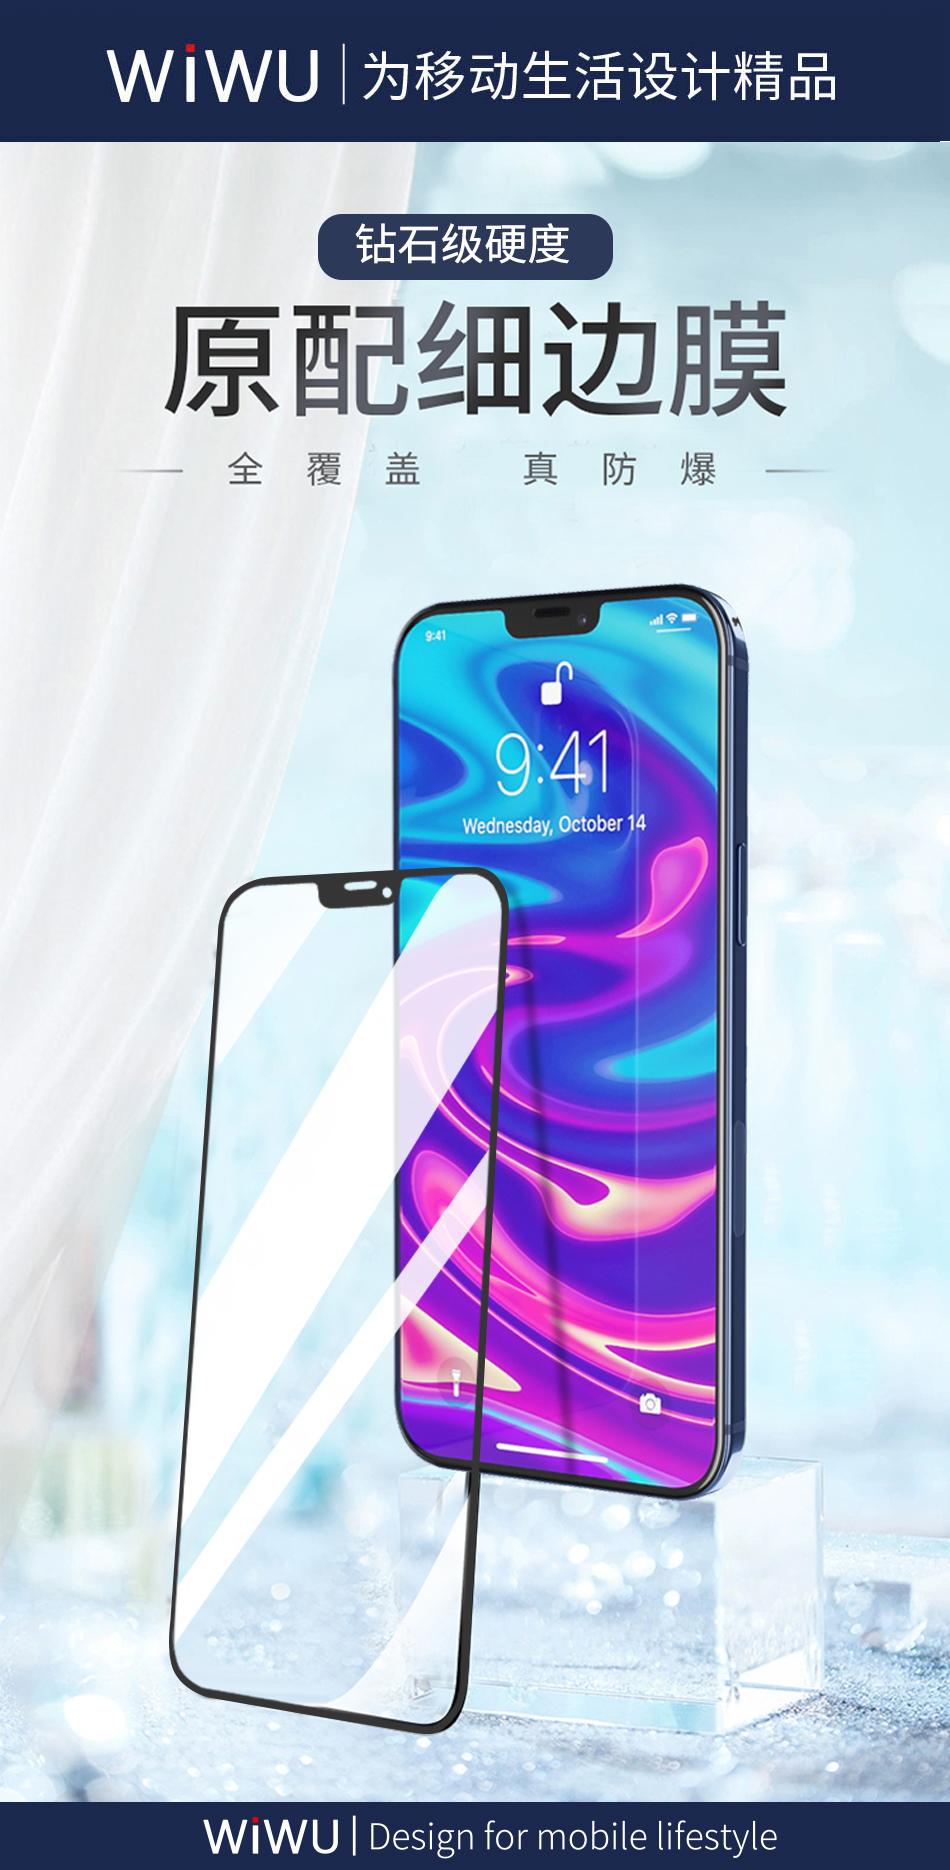 WiWU 2.5D 窄边 丝印 钢化膜 iPhone12 (https://www.wiwu.net.cn/) 手机 壳 膜 第6张